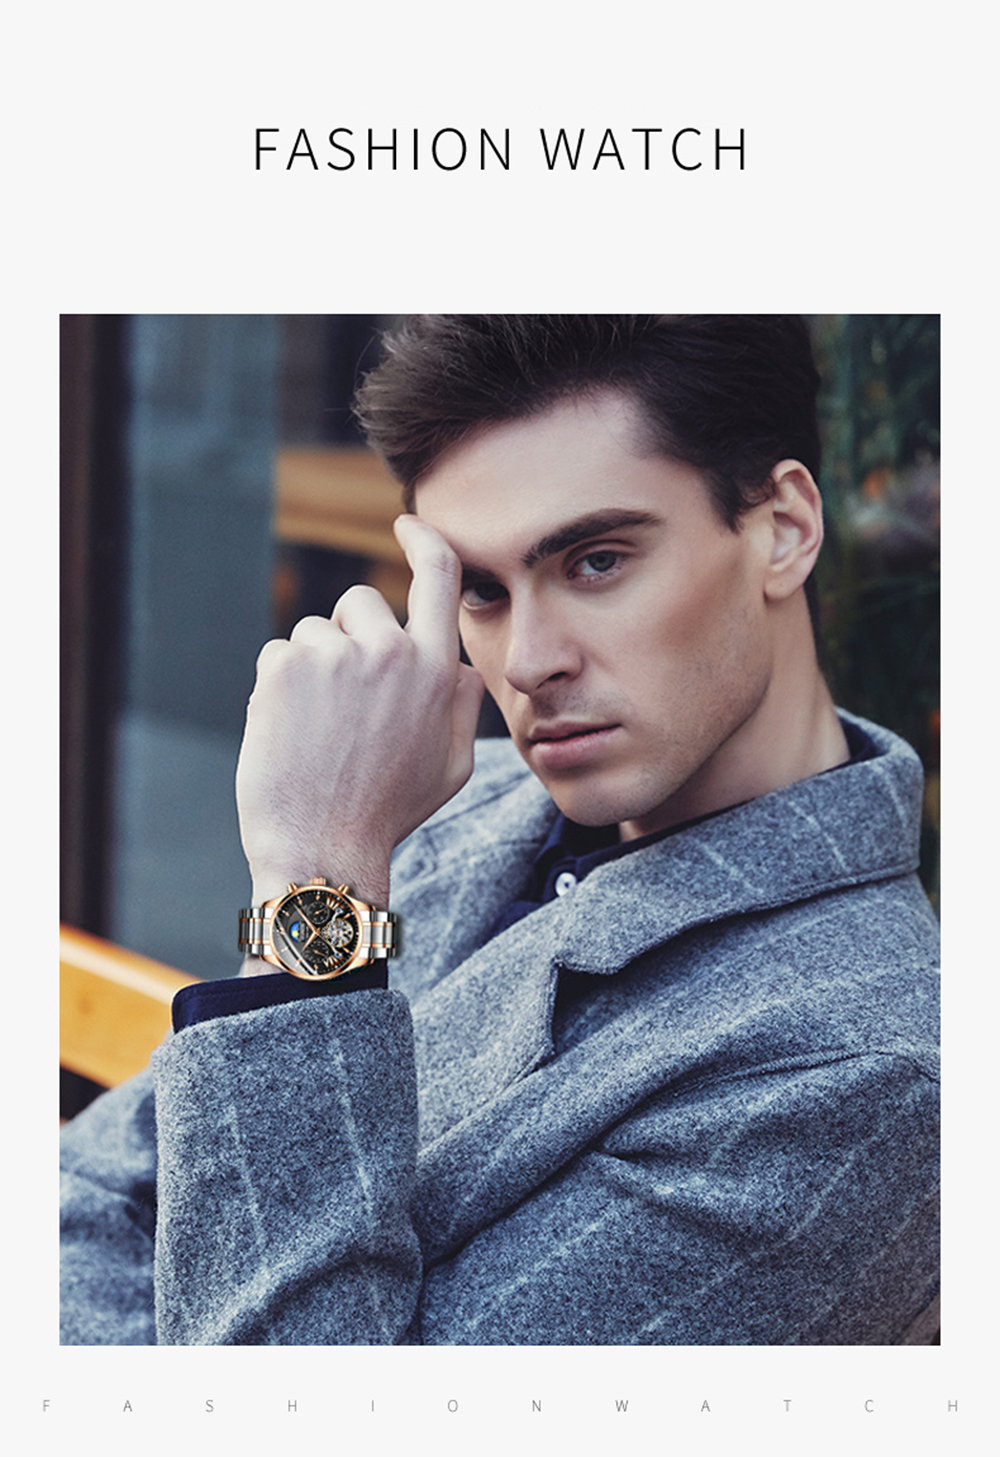 HTB1 .ZsRhjaK1RjSZFAq6zdLFXaW GUANQIN 2019 clock men's/mens watches top brand luxury automatic/mechanical/luxury watch men gold tourbillon mens reloj hombre